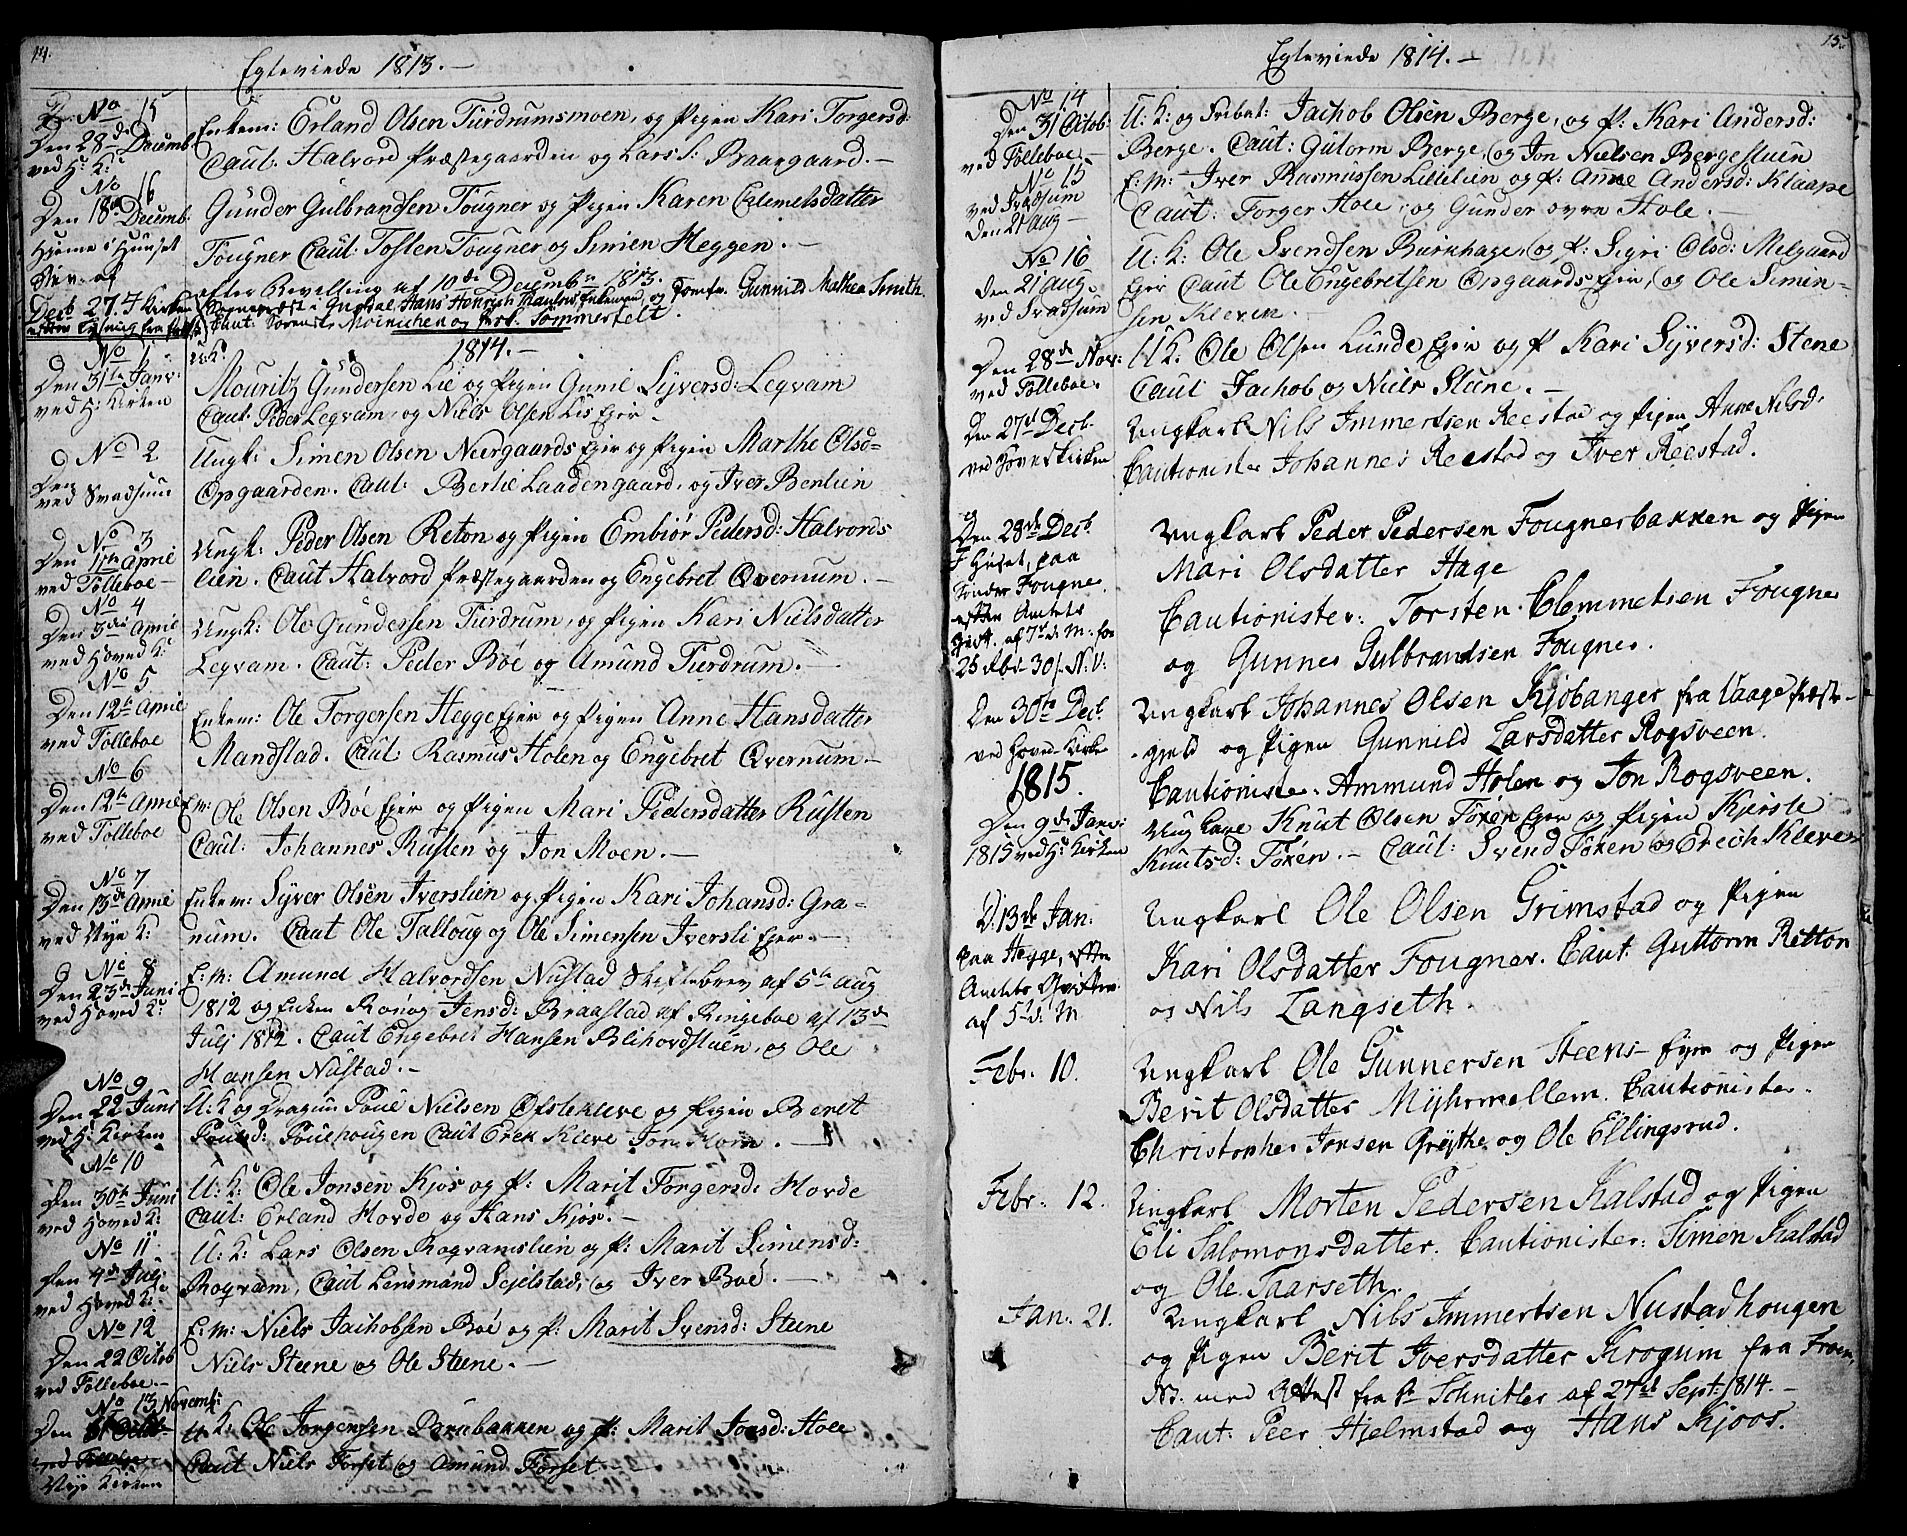 SAH, Gausdal prestekontor, Ministerialbok nr. 4, 1809-1817, s. 14-15